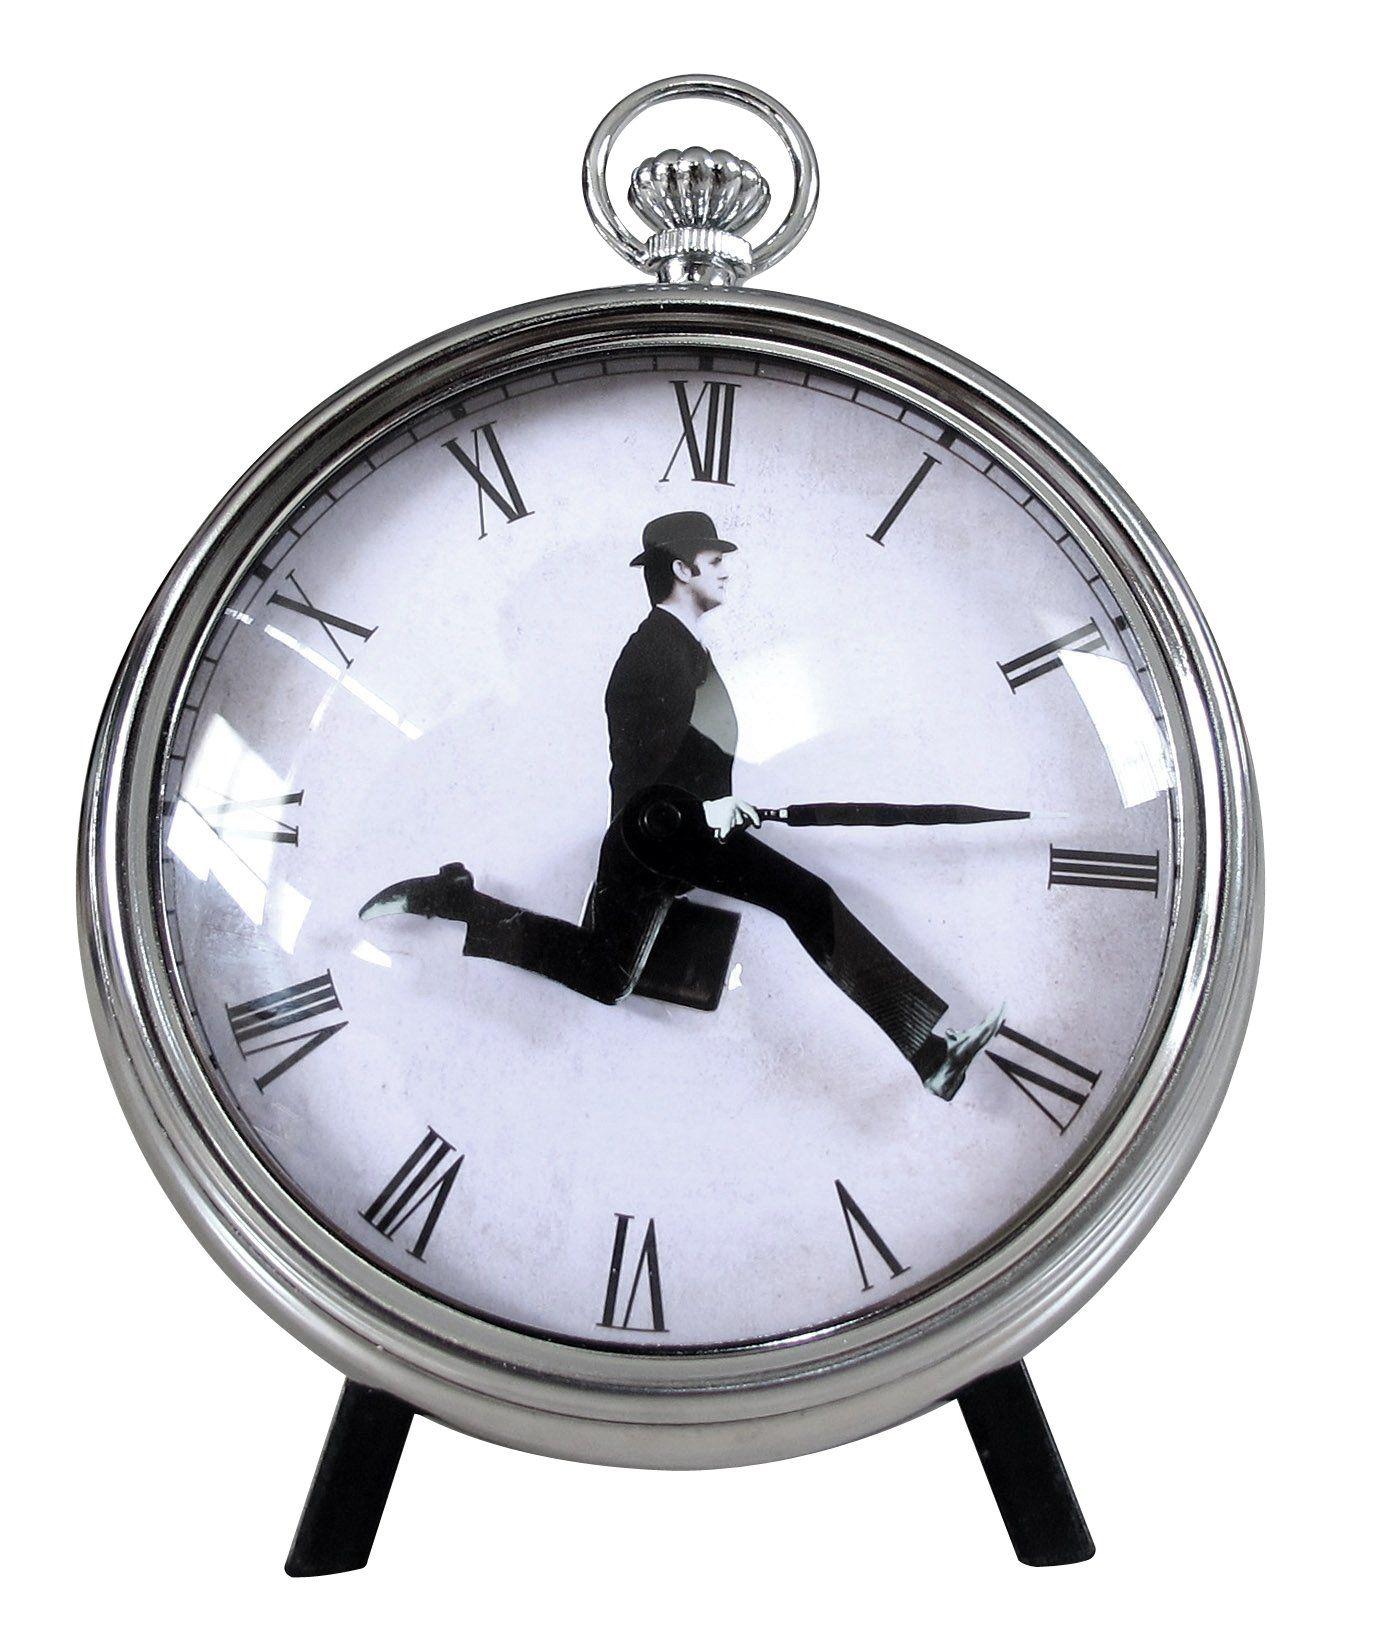 Amazon Com Ministry Of Silly Walks Pocket Watch Desk Wall Clock Monty Python Clock Wall Clock Monty Python